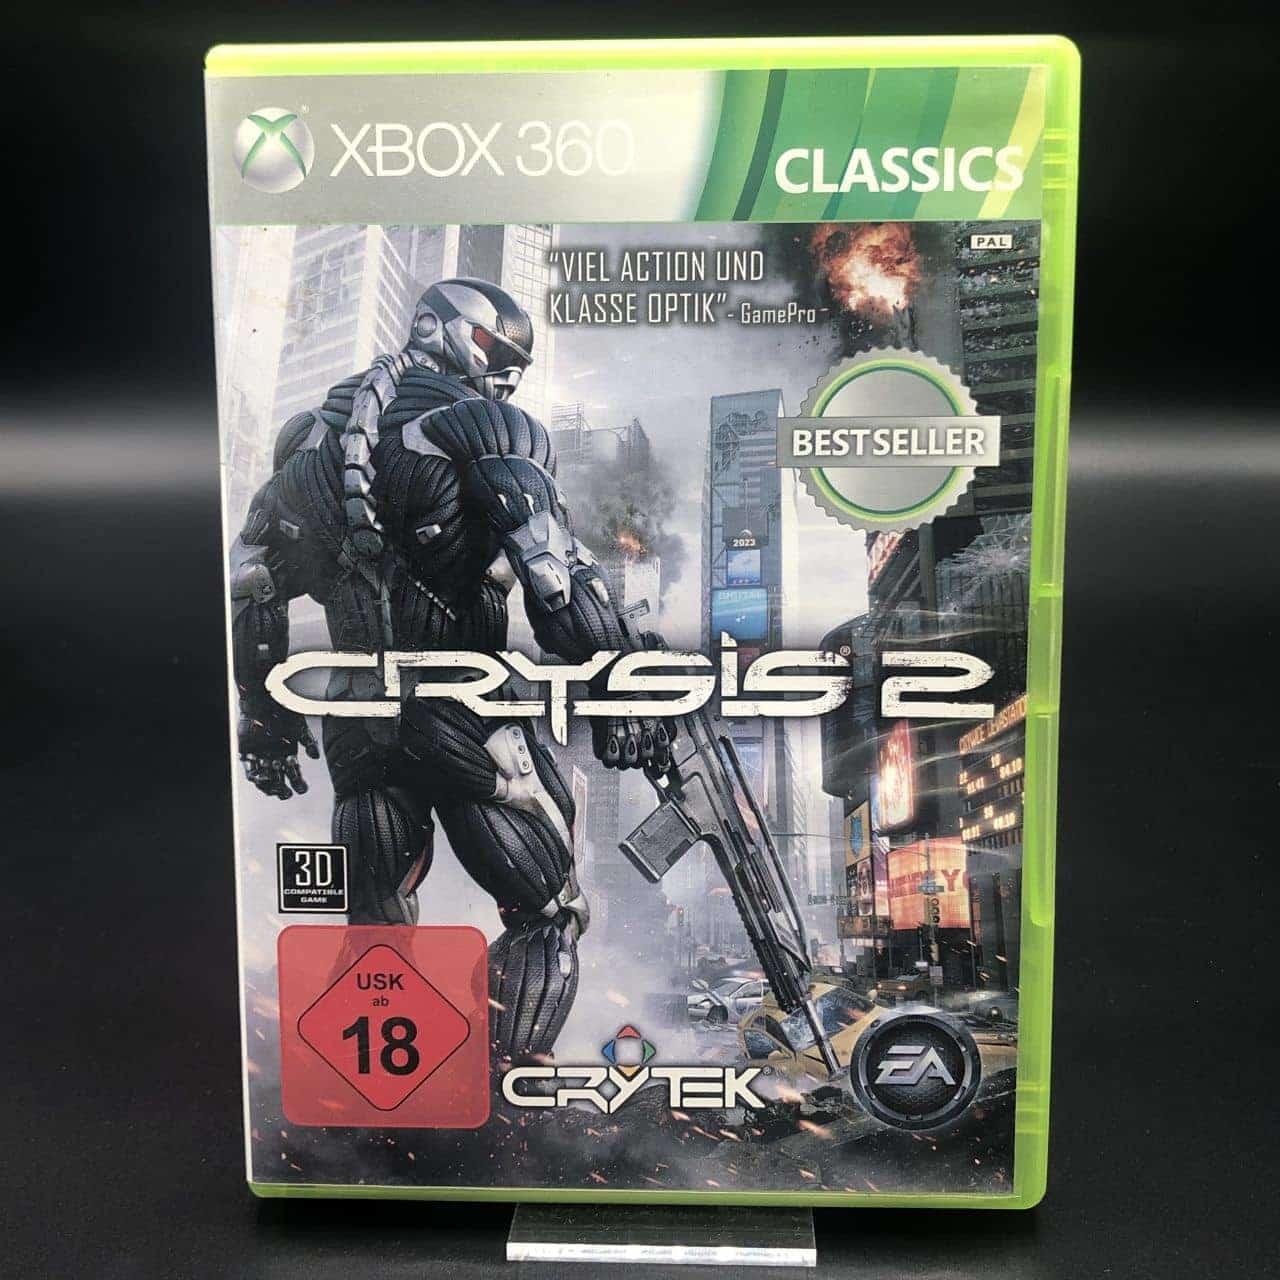 Crysis 2 (Classics) (Komplett) (Gut) XBOX 360 (FSK18)